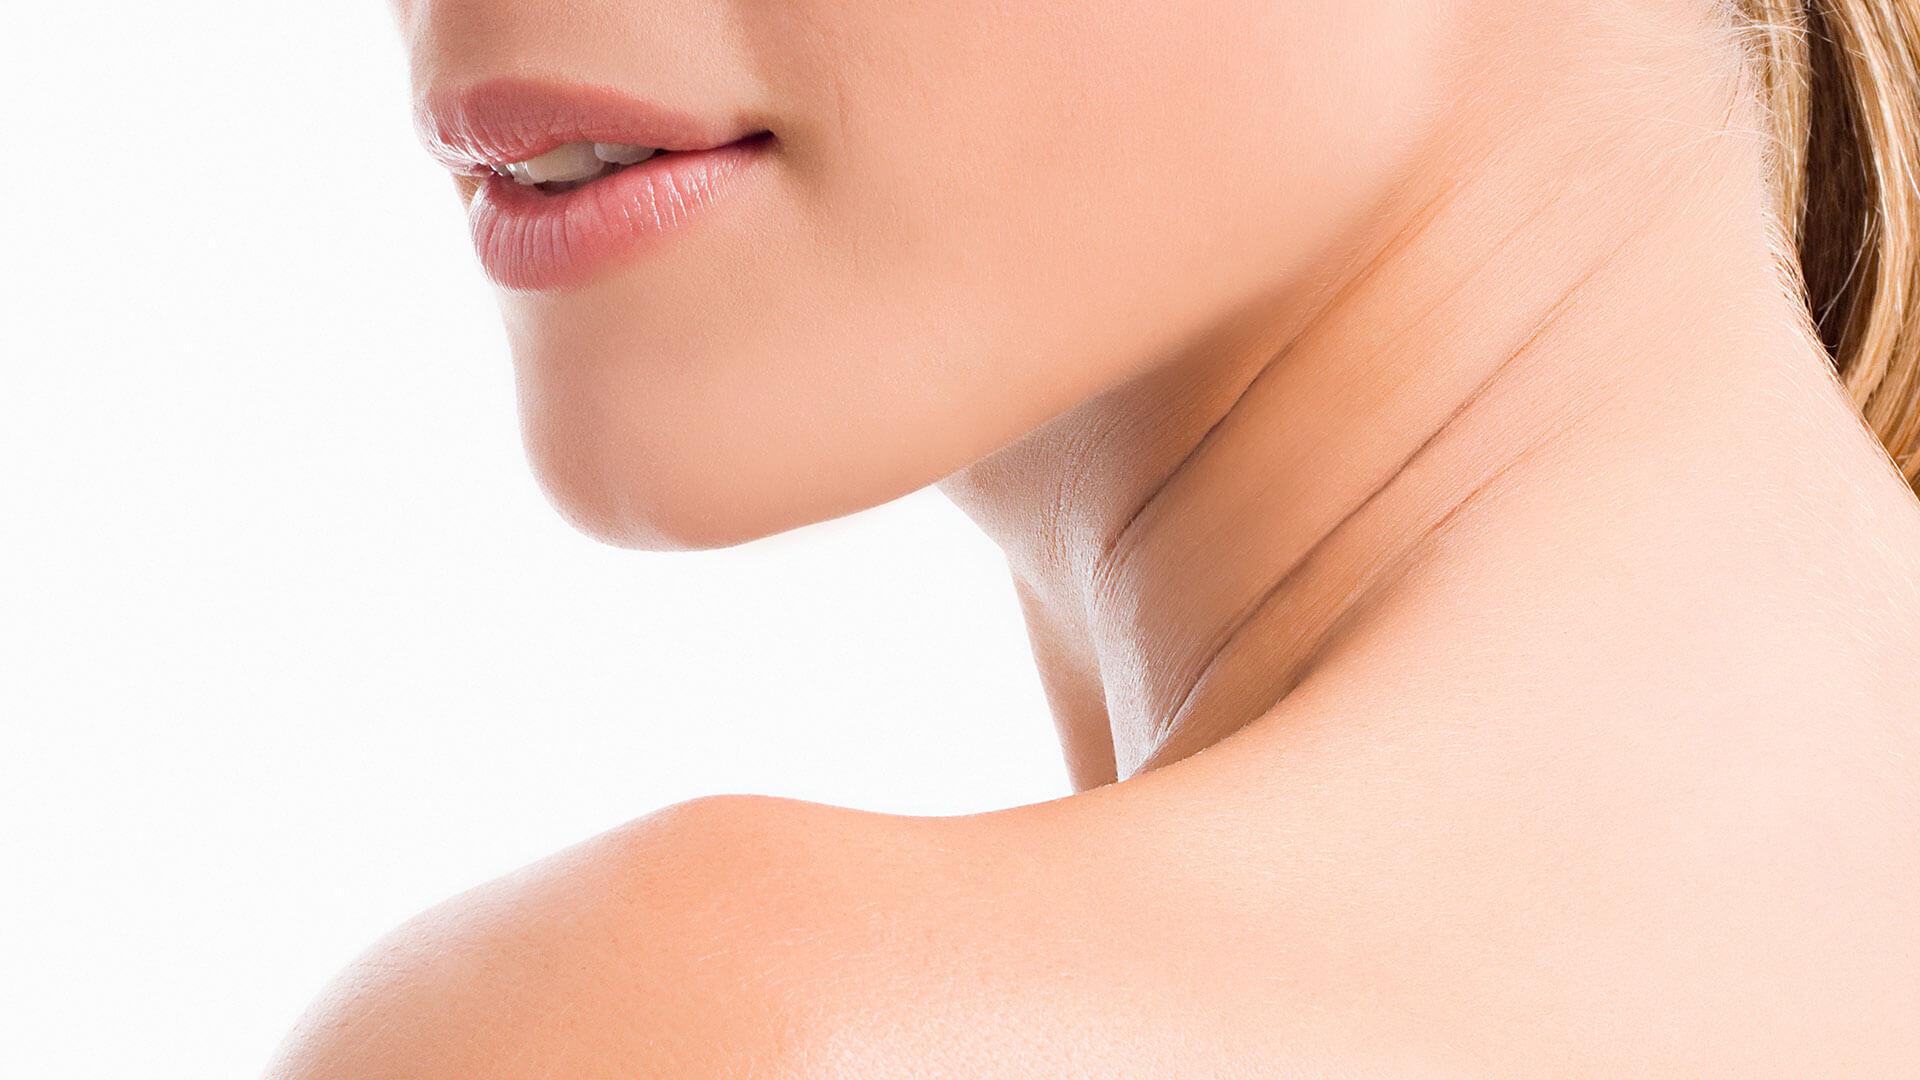 The Gentle, Non-Invasive Alternative to Plastic Surgery